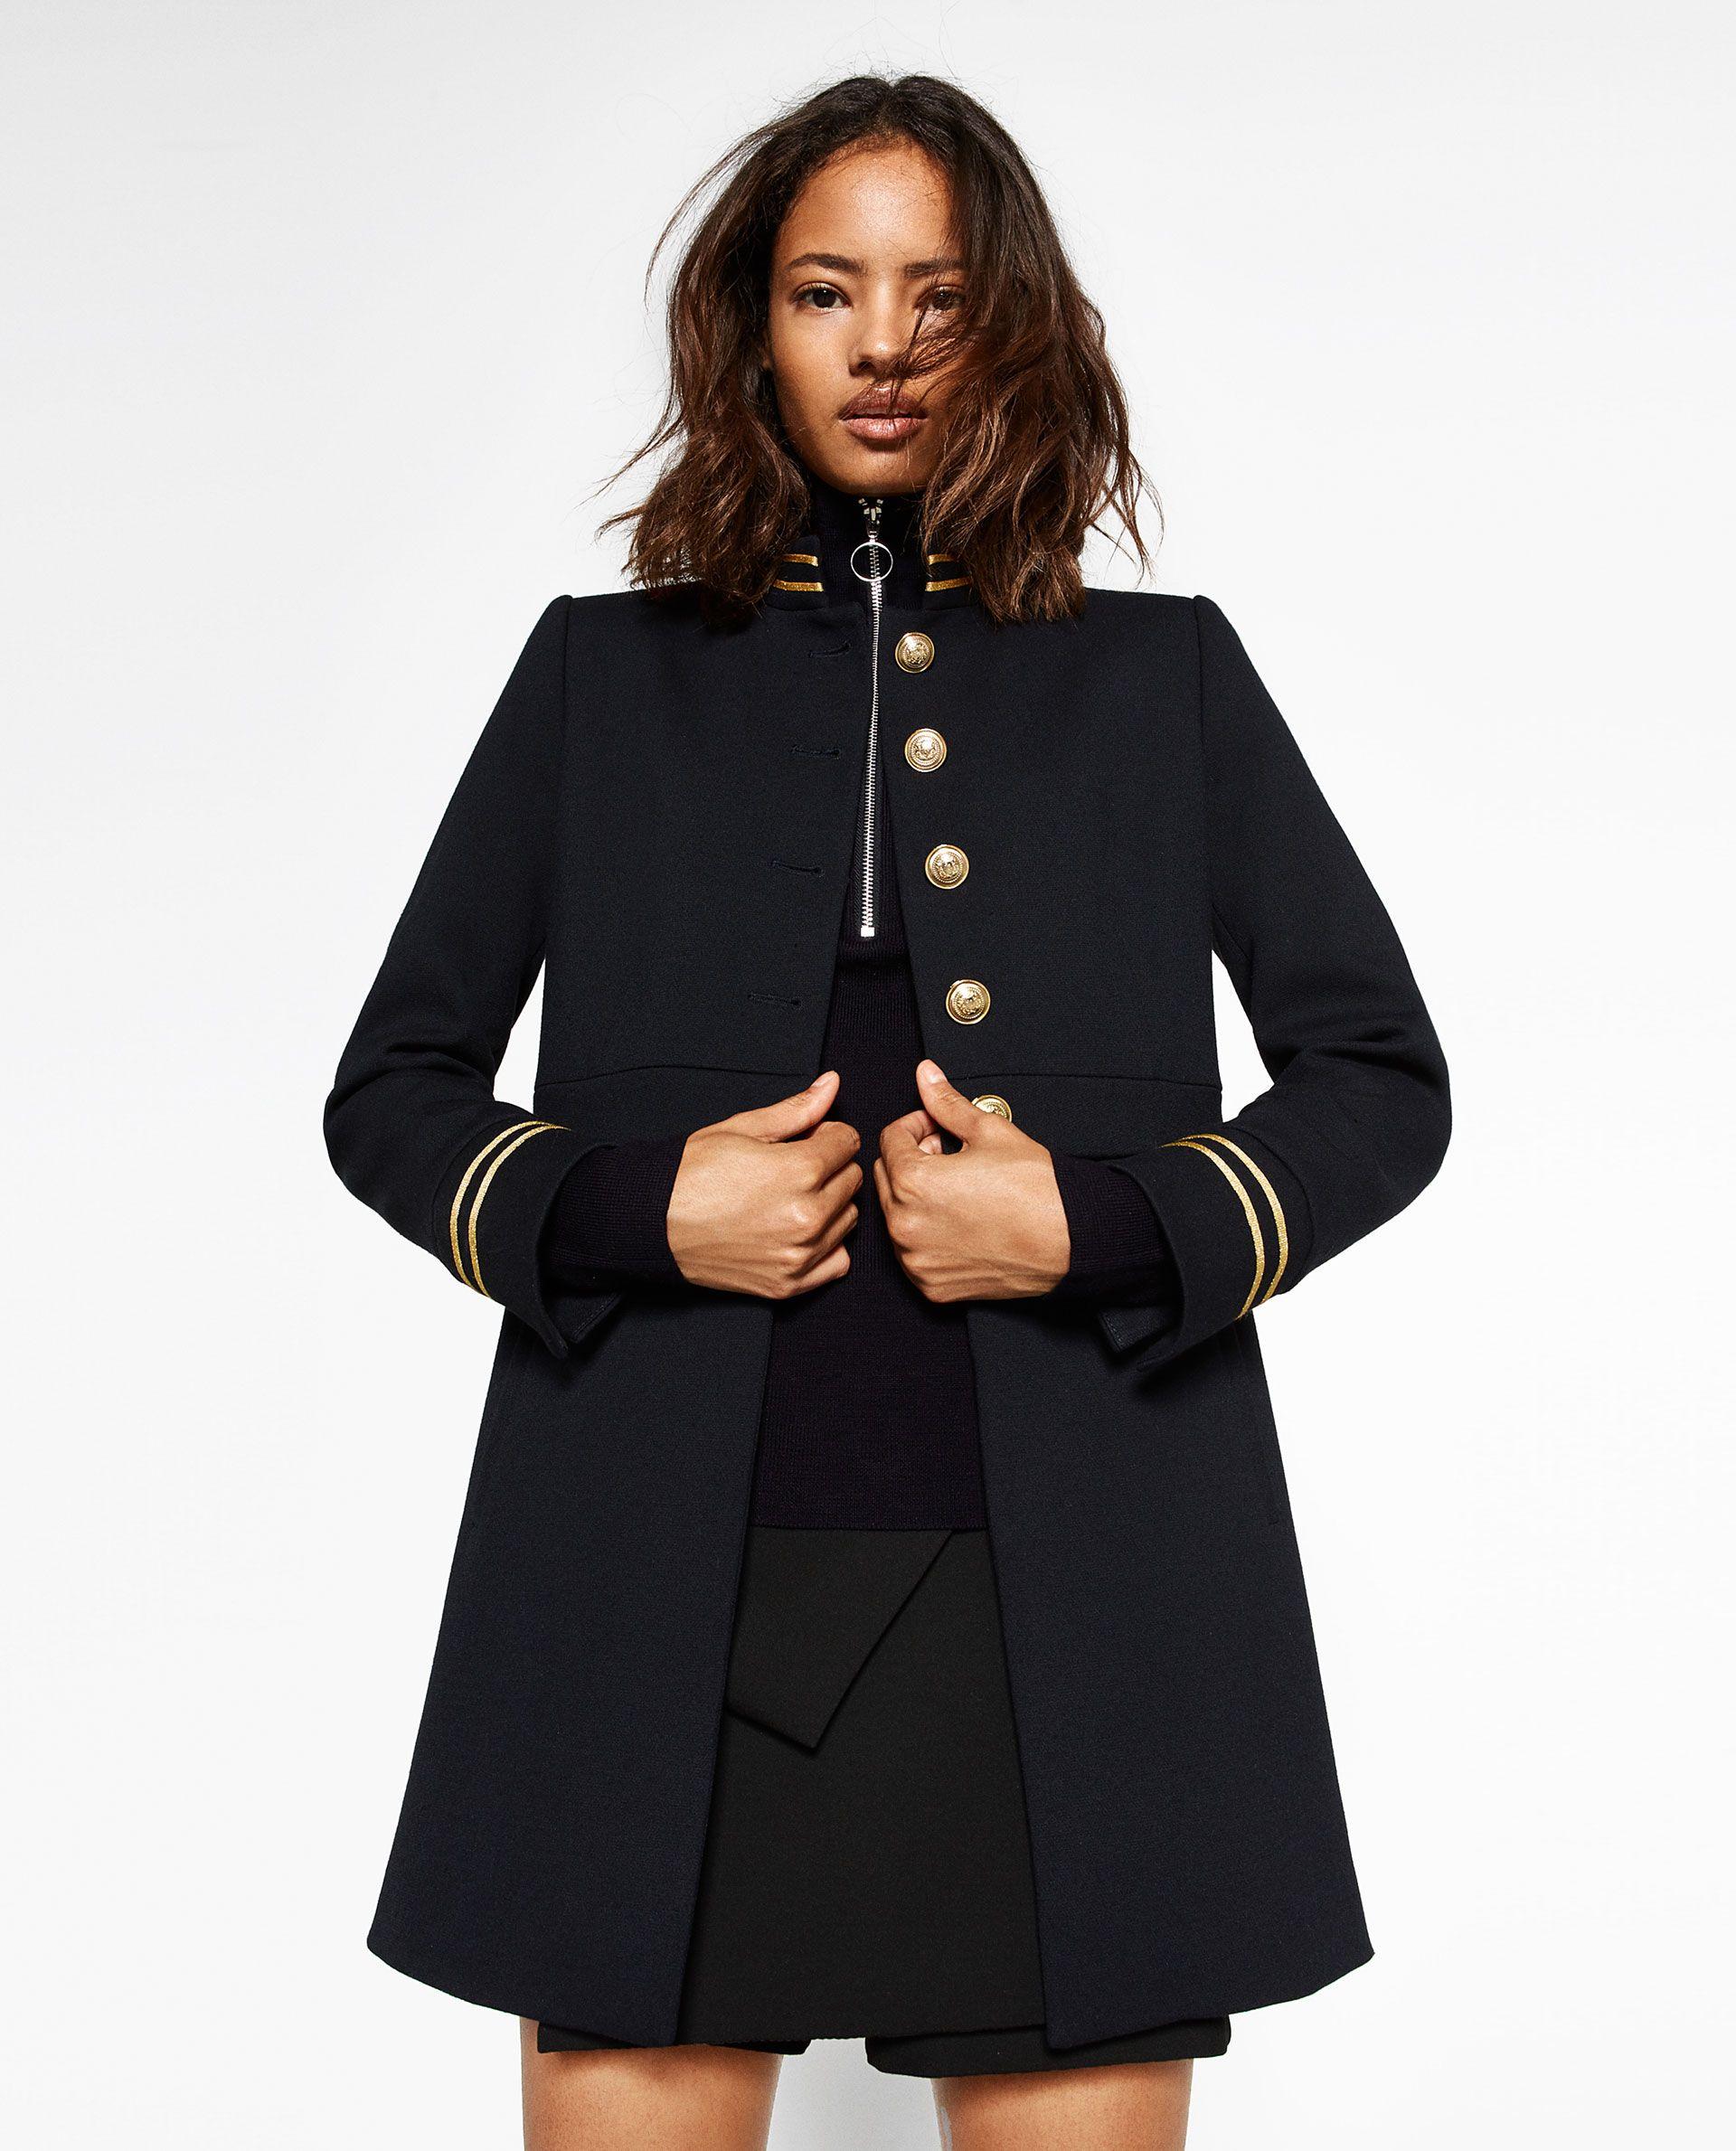 ZARA WOMAN MANDARIN COLLAR FROCK COAT | Chaqueta militar